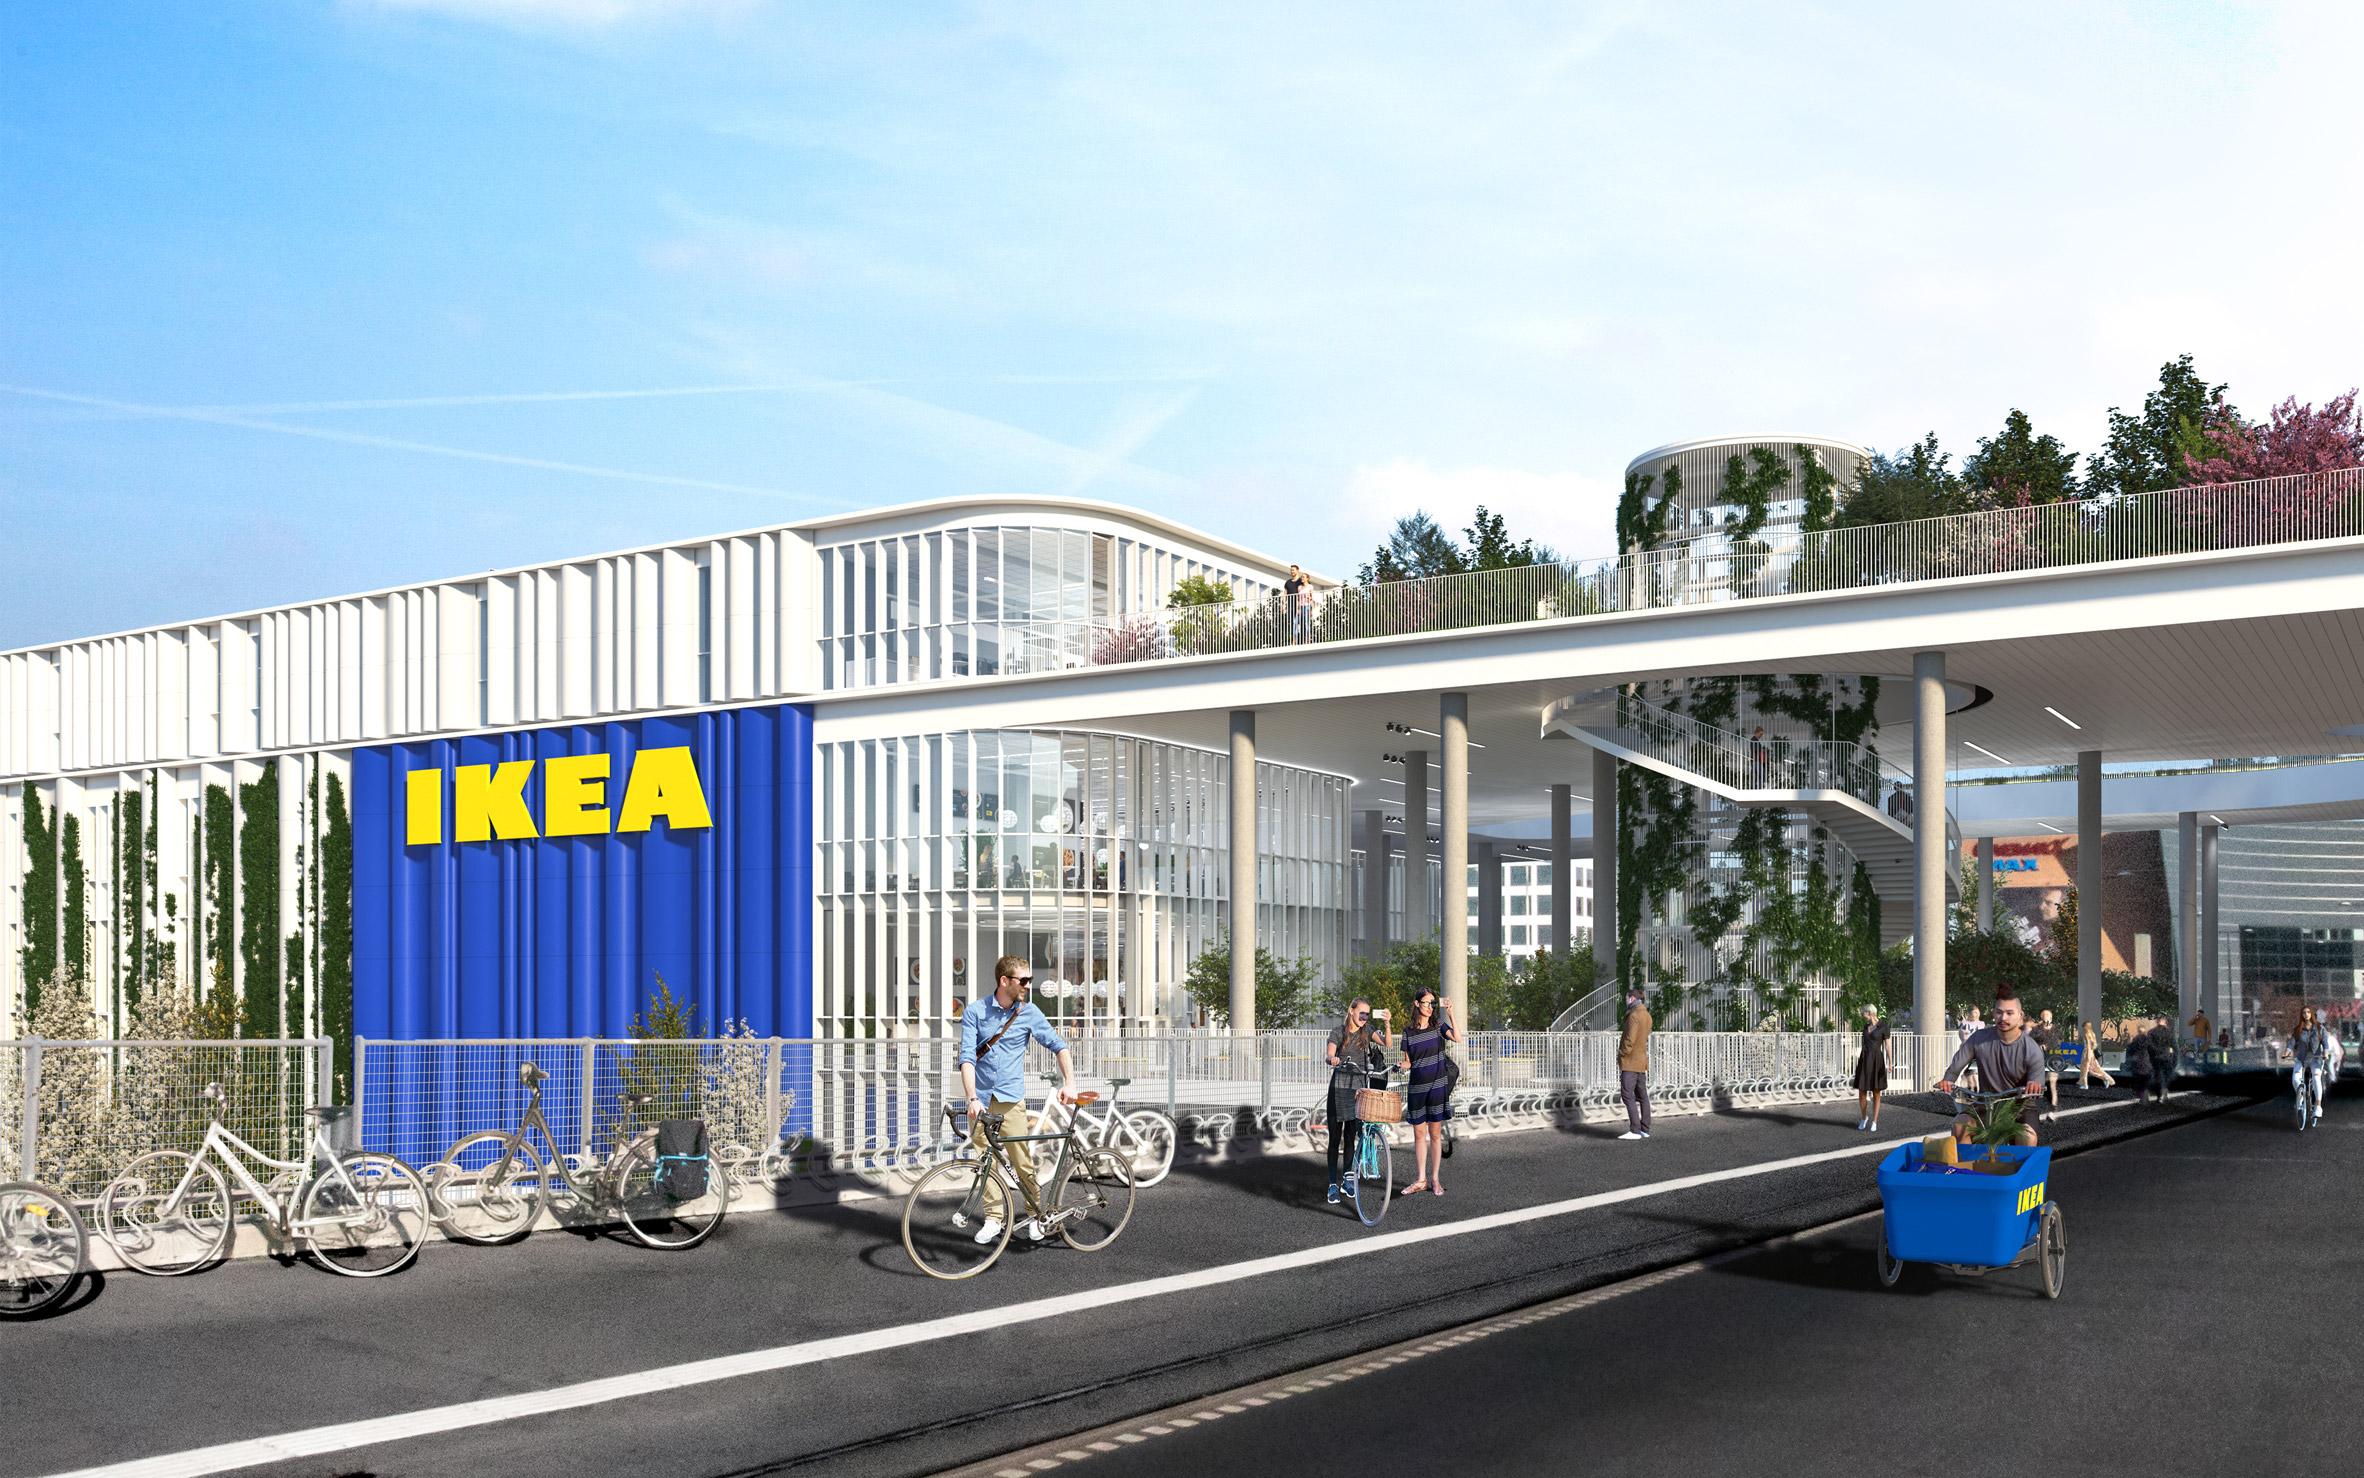 IKEA Kodaň